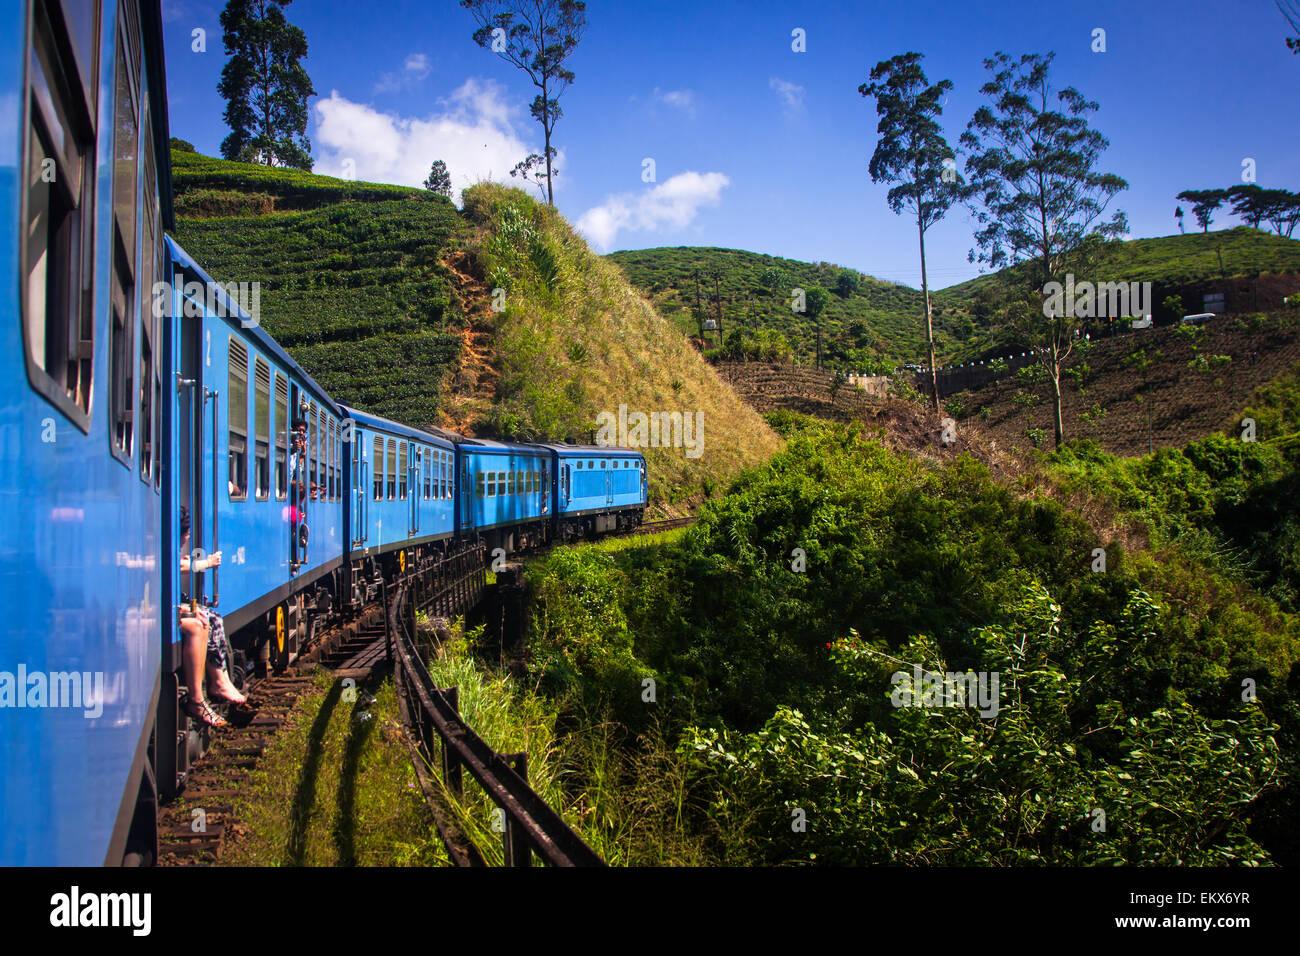 train from Nuwara Eliya to Kandy among tea plantations in the highlands of Sri Lanka - Stock Image